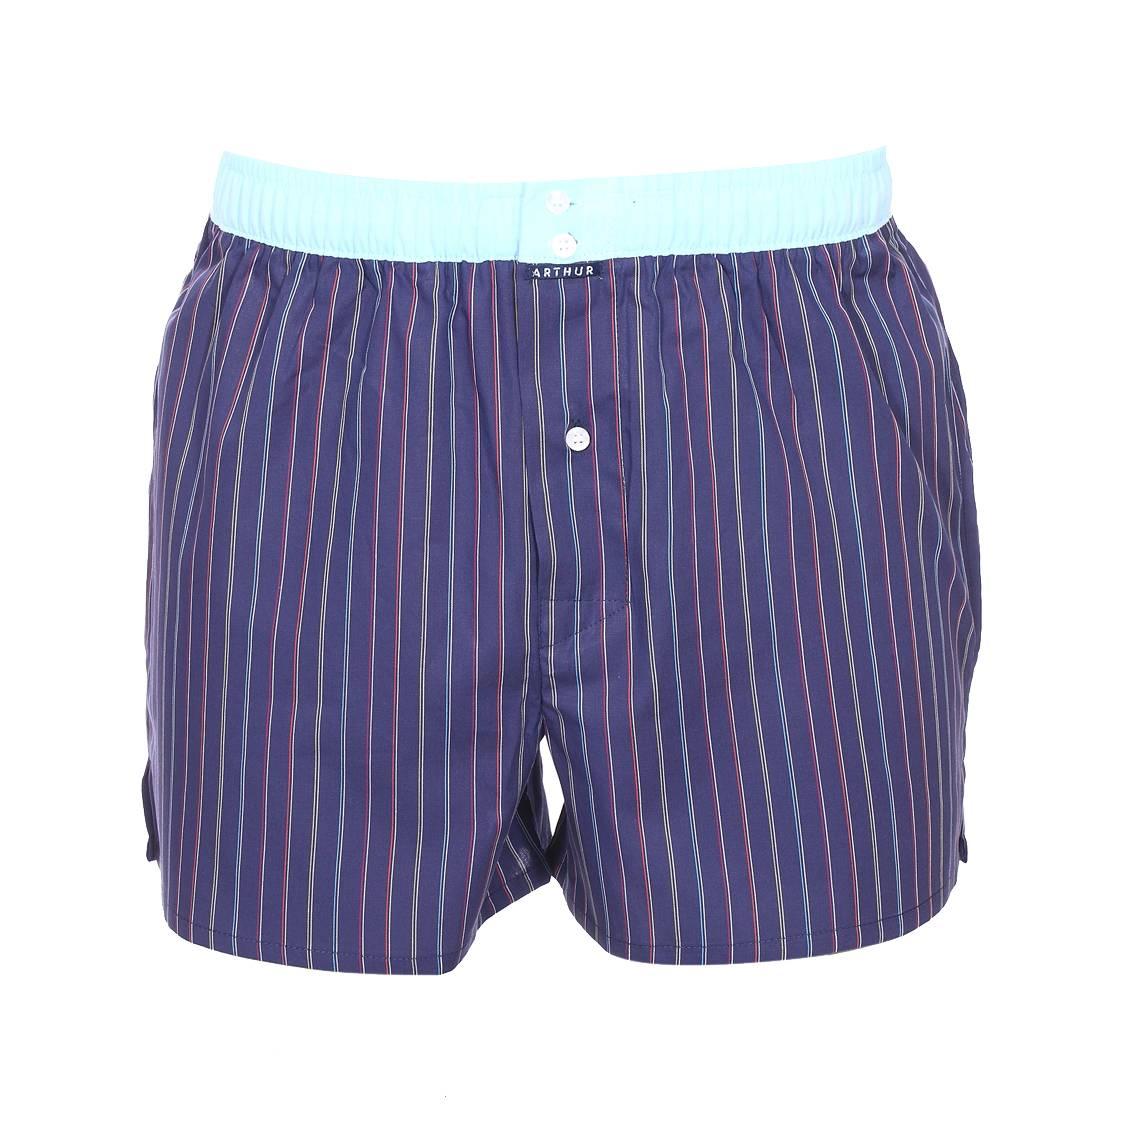 Caleçon  club en coton bleu marine à fines rayures